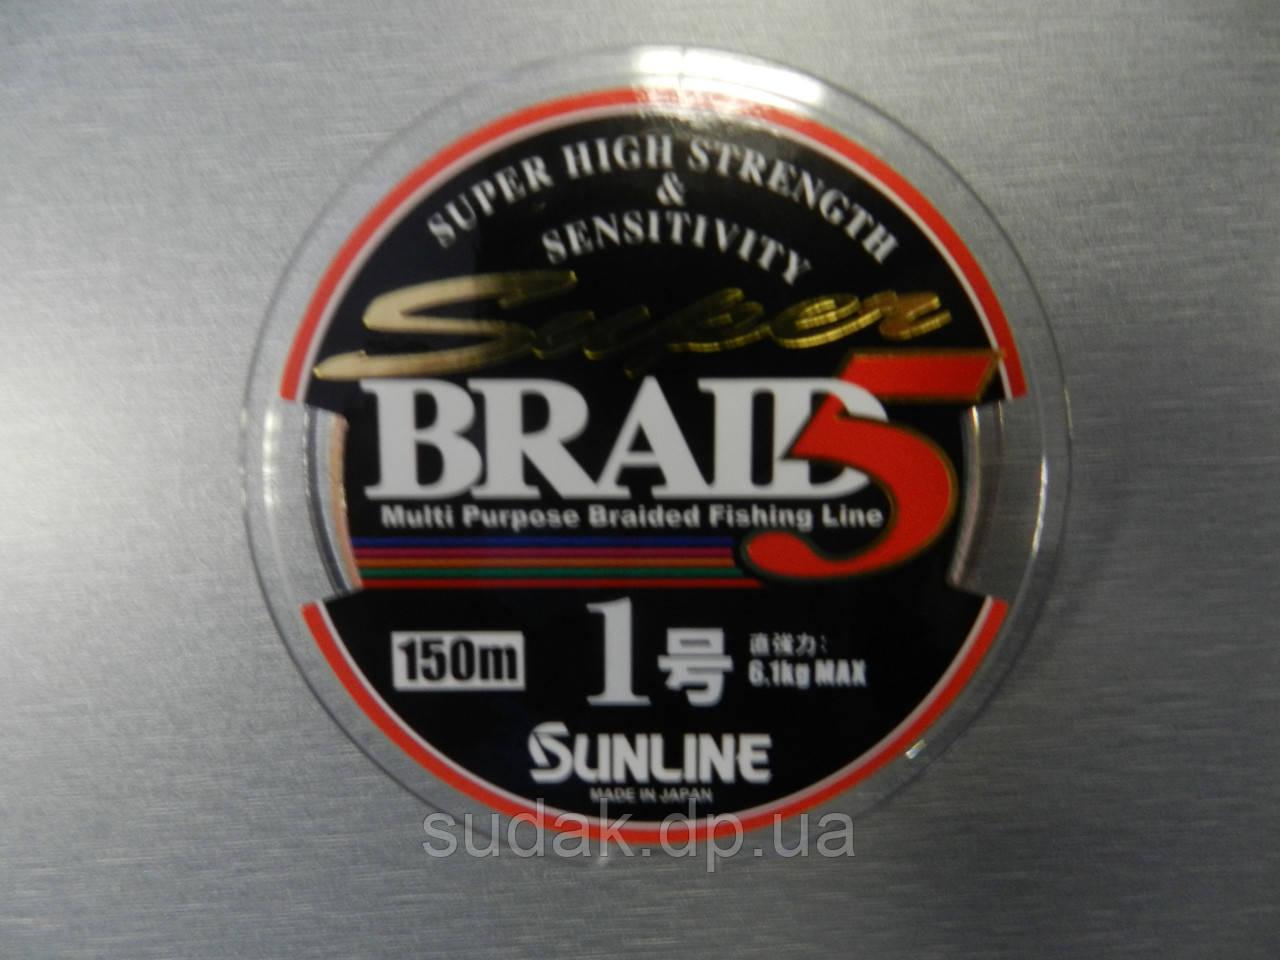 Шнур Sunline Super Braid 5 150m #1.0 / 0.165mm 6.1kg